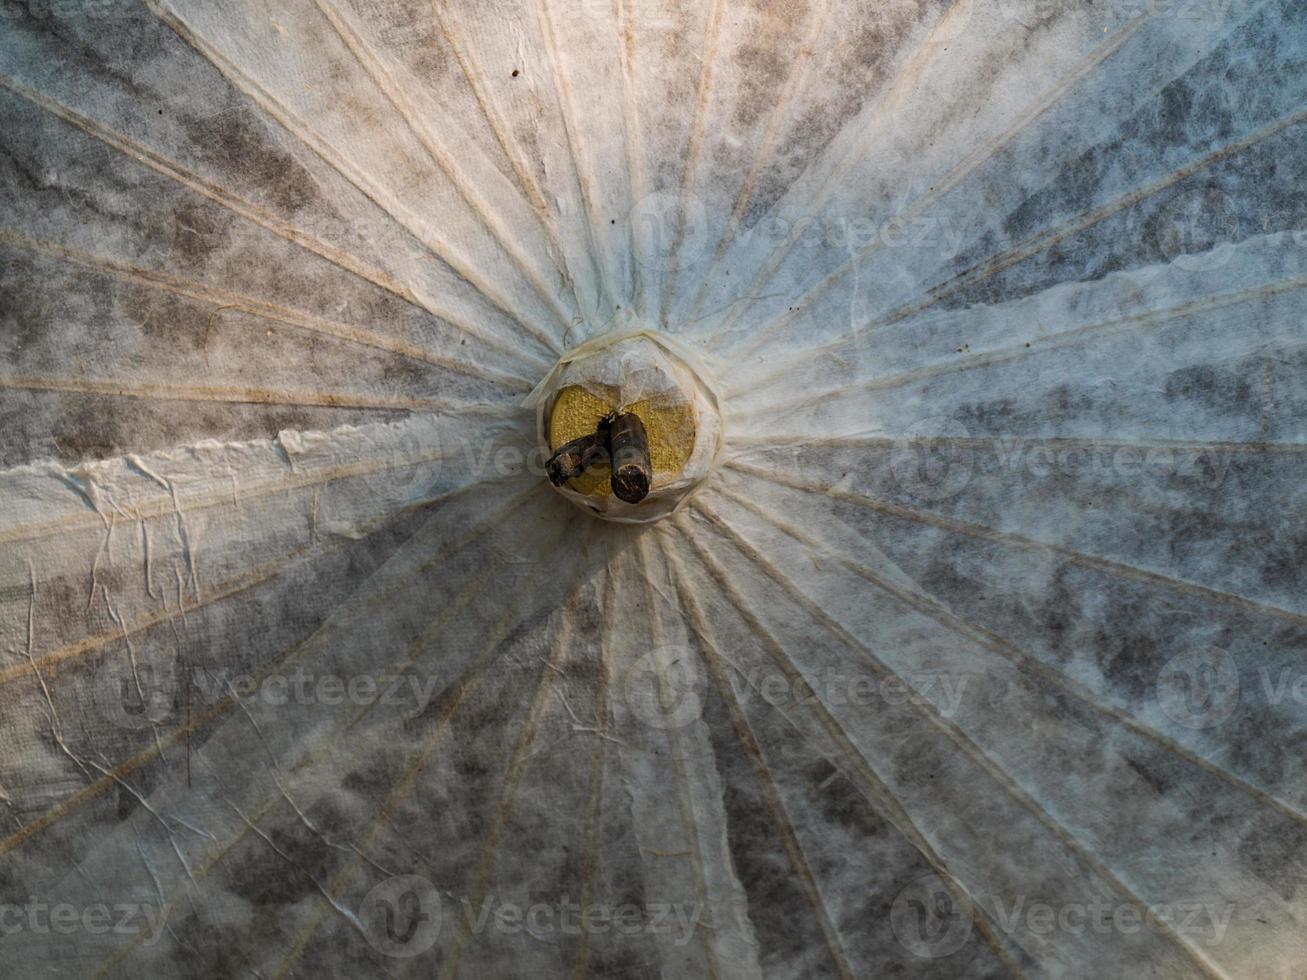 Rice paper umbrella dried in nature photo